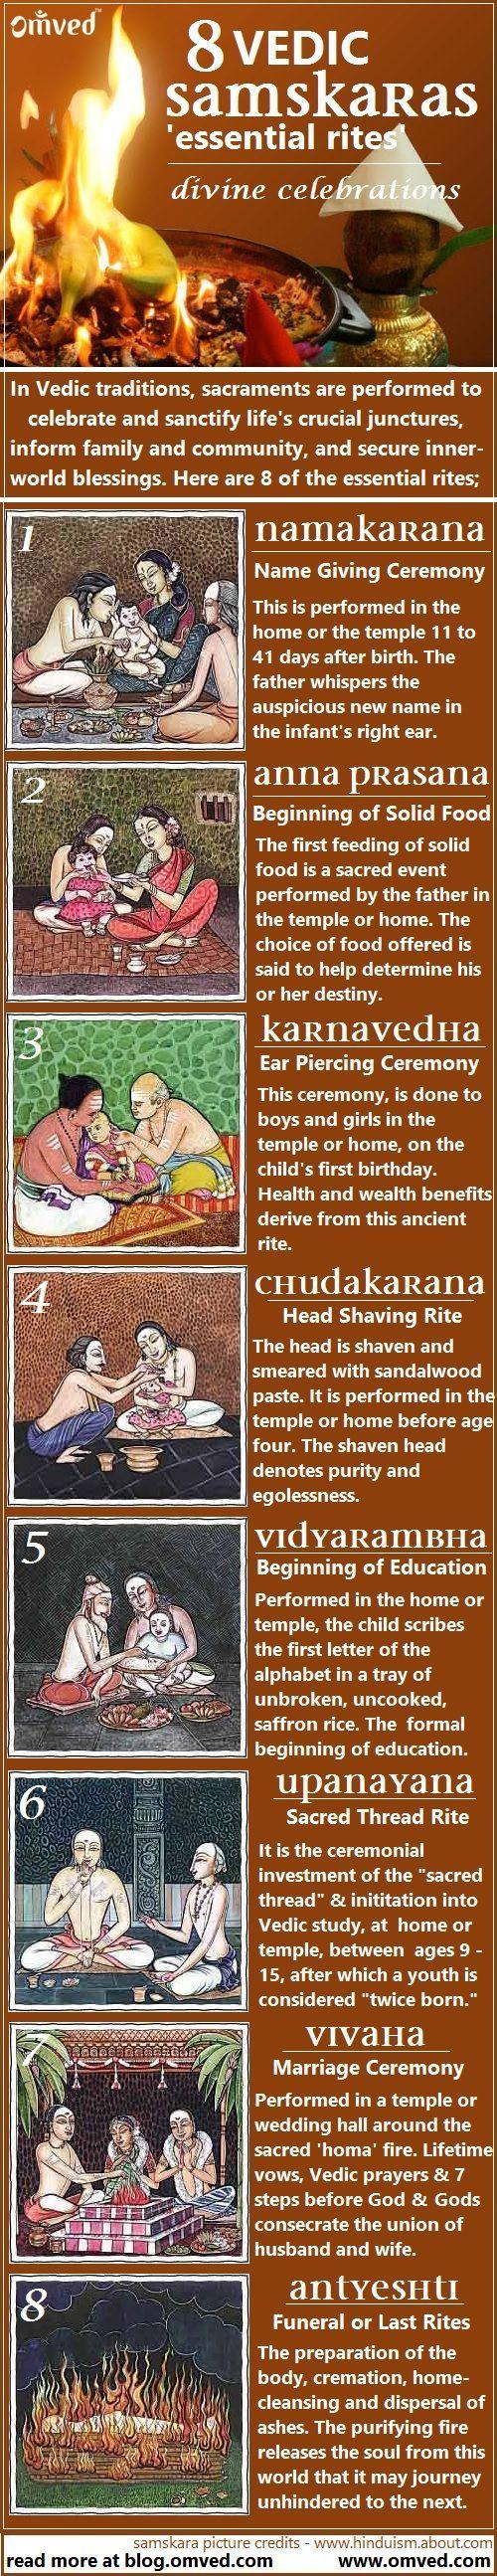 Eight Vedic Samskaras Essential Rites